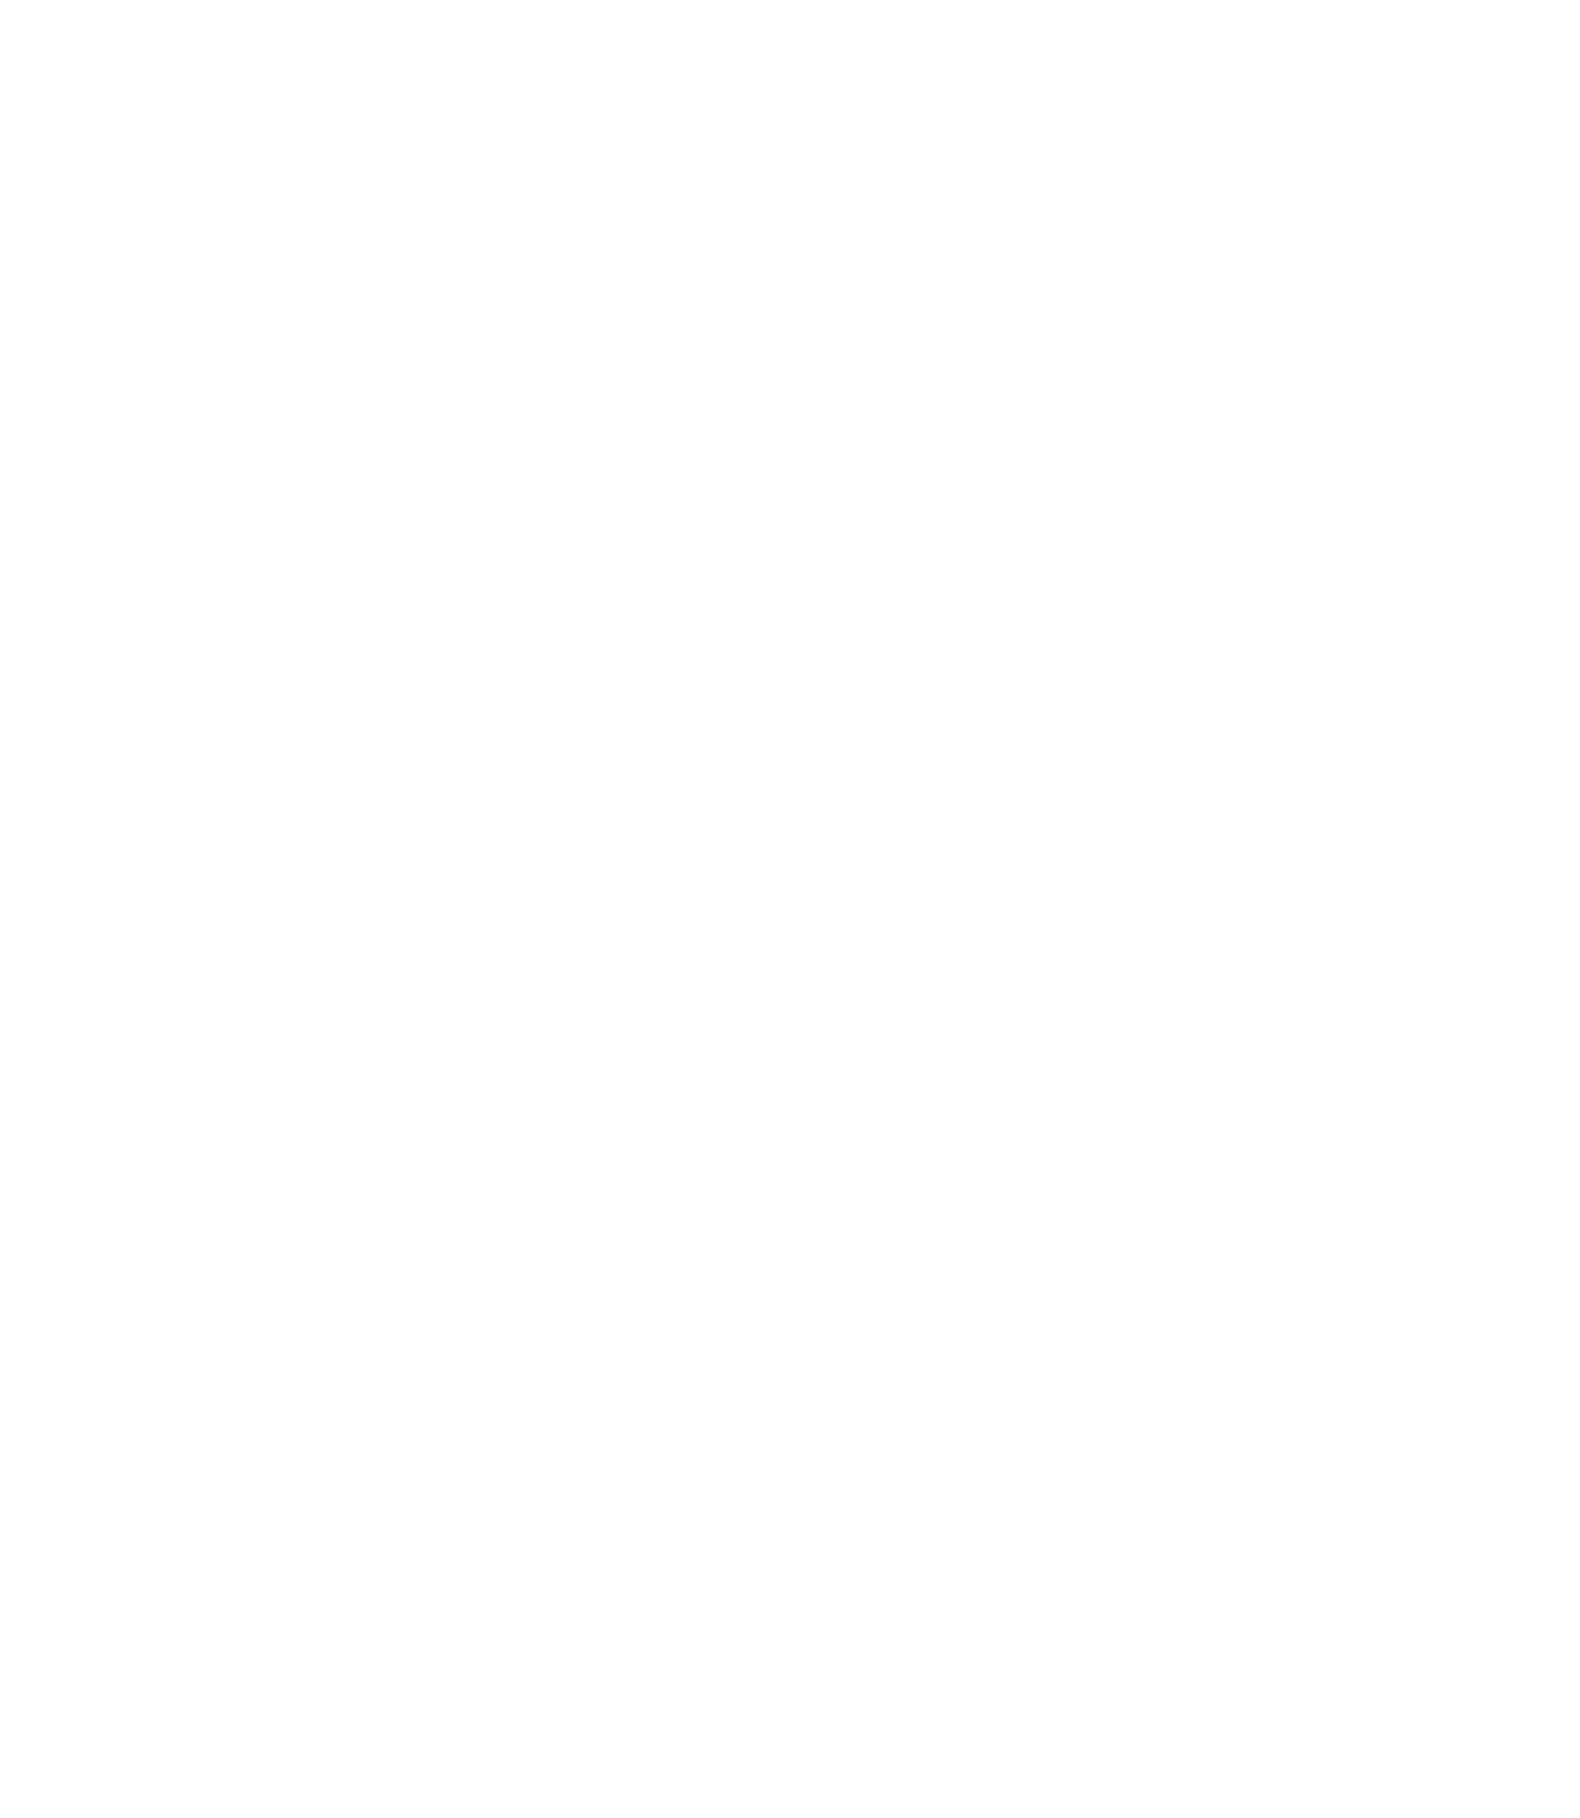 Studio Perle Noire Tattoo SXM